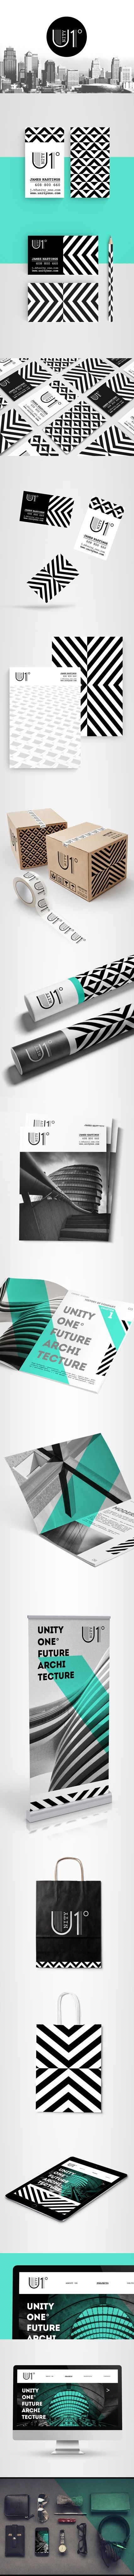 Identity created for modern architecture studio.: